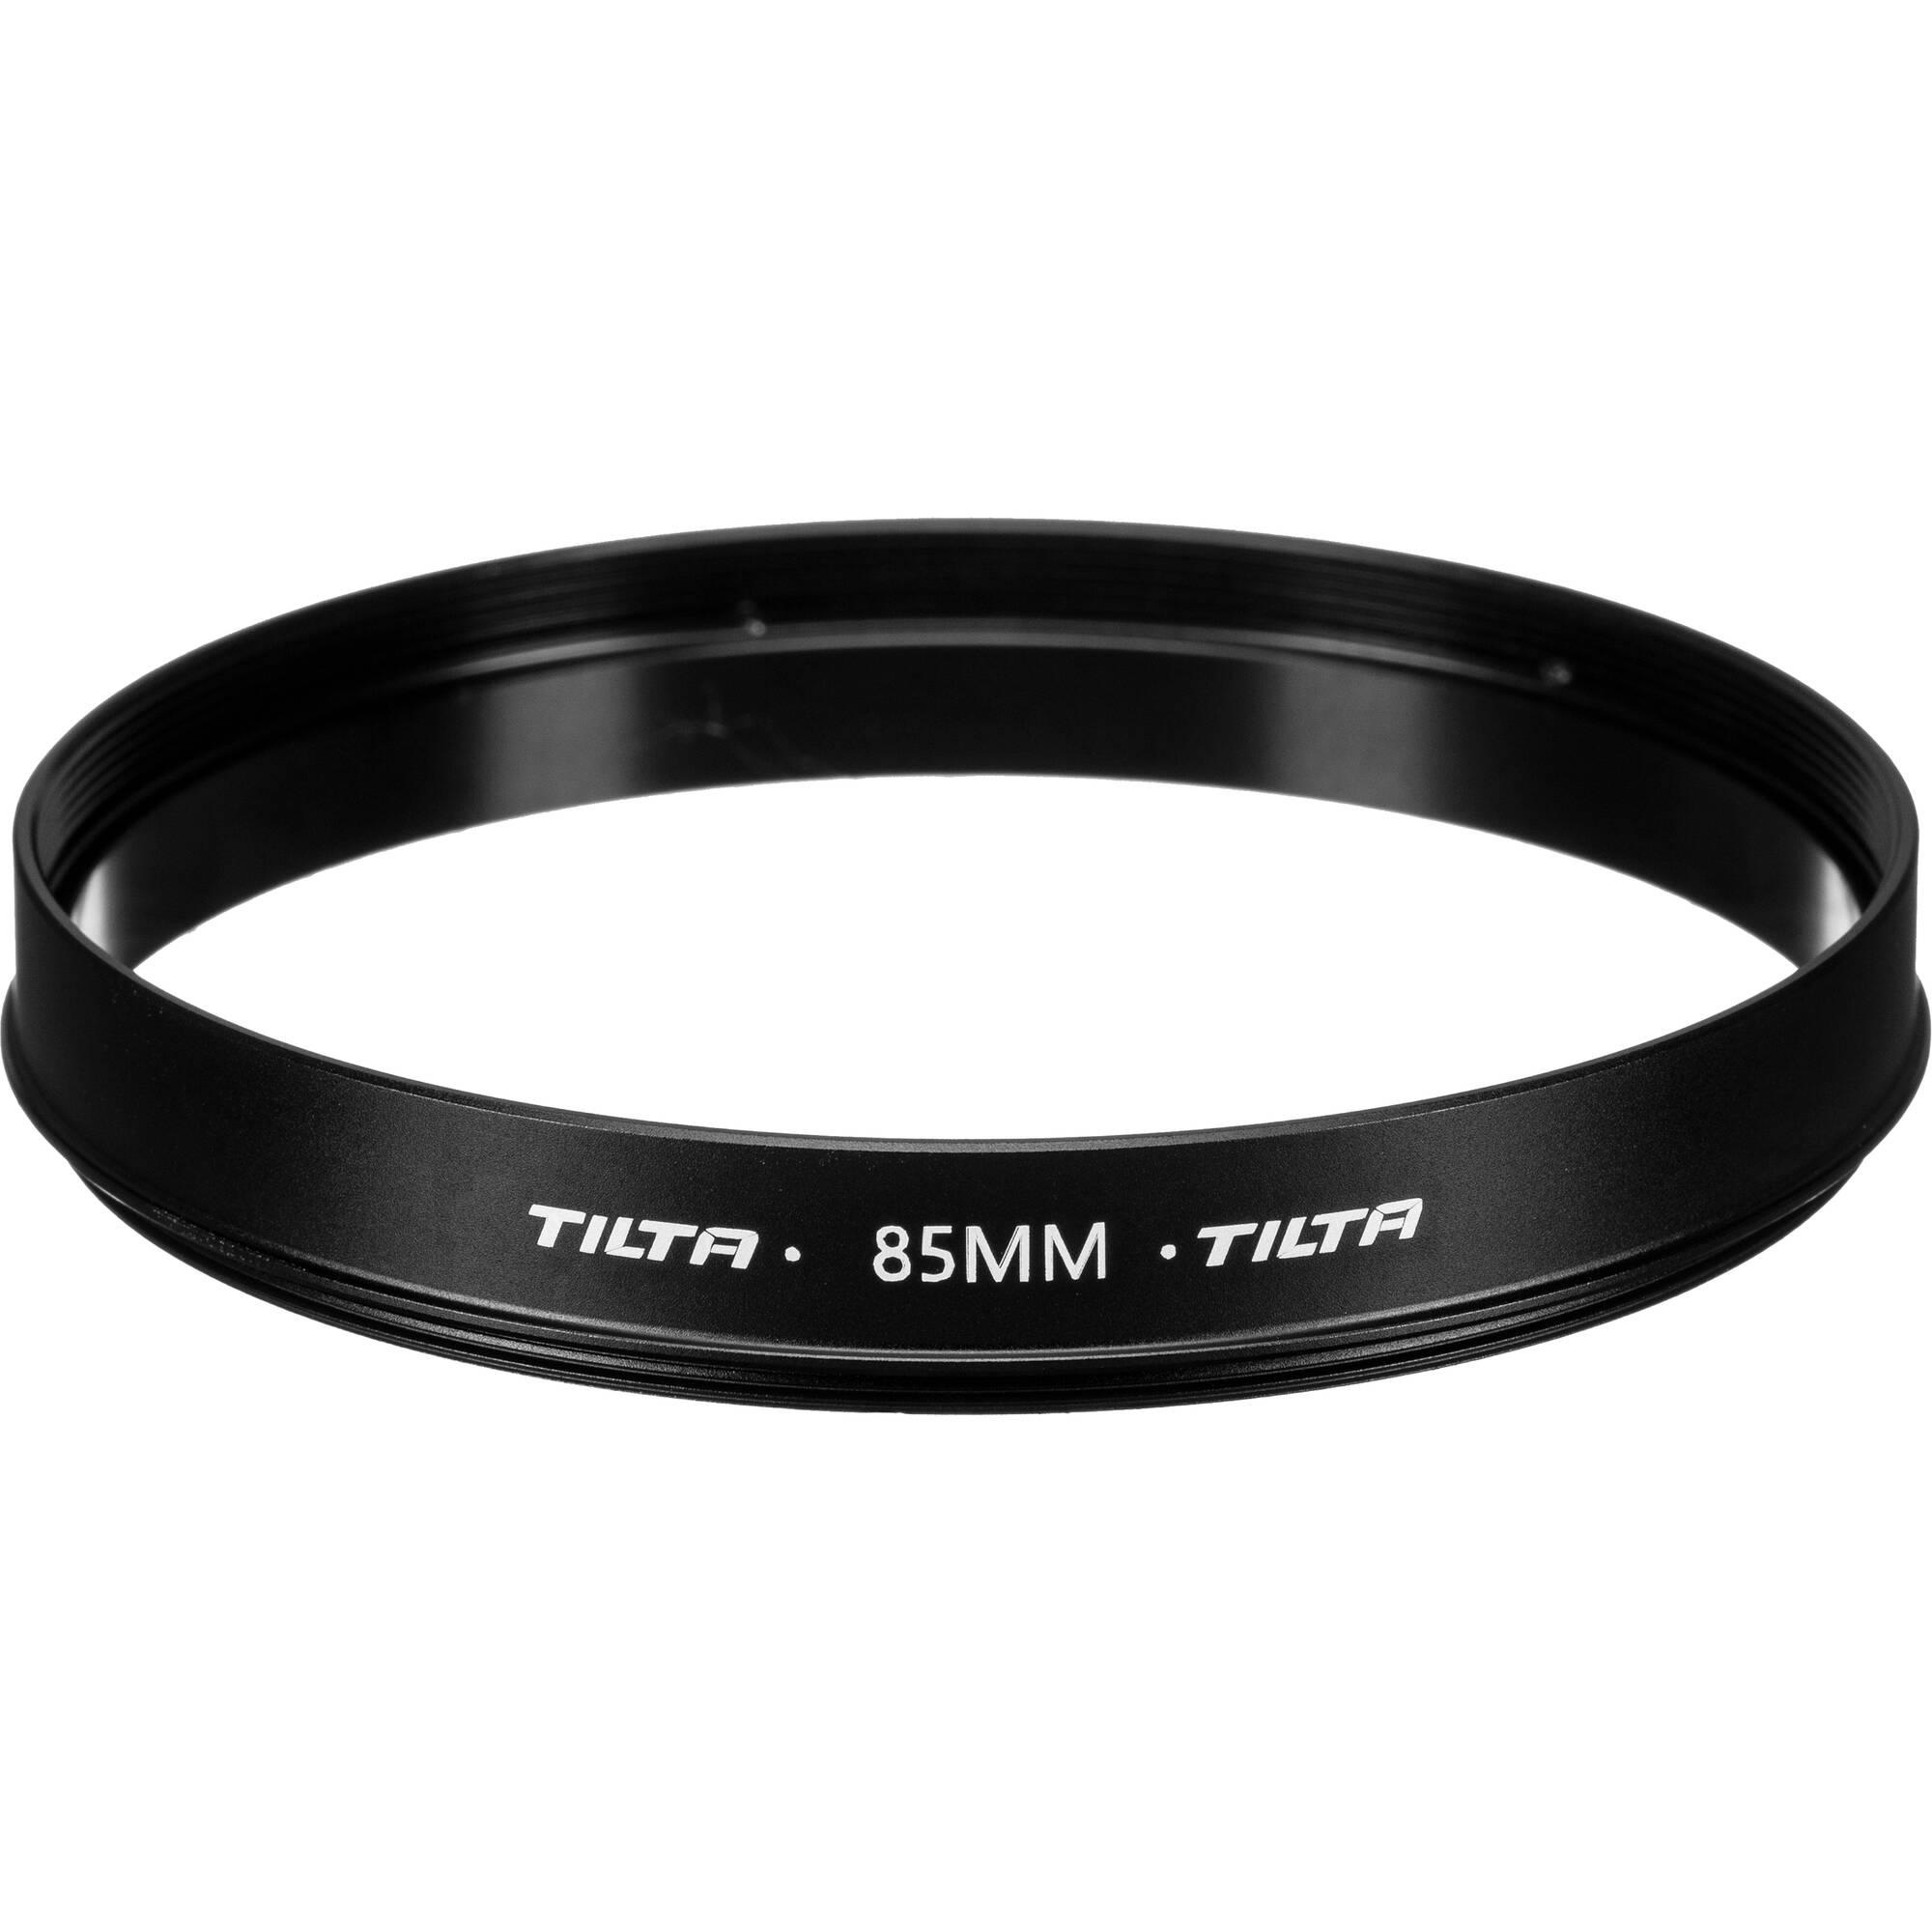 MB-T15 Mini Clip-On Matte Box lens Shade For DSLR Tilta Lens Hood Accessories